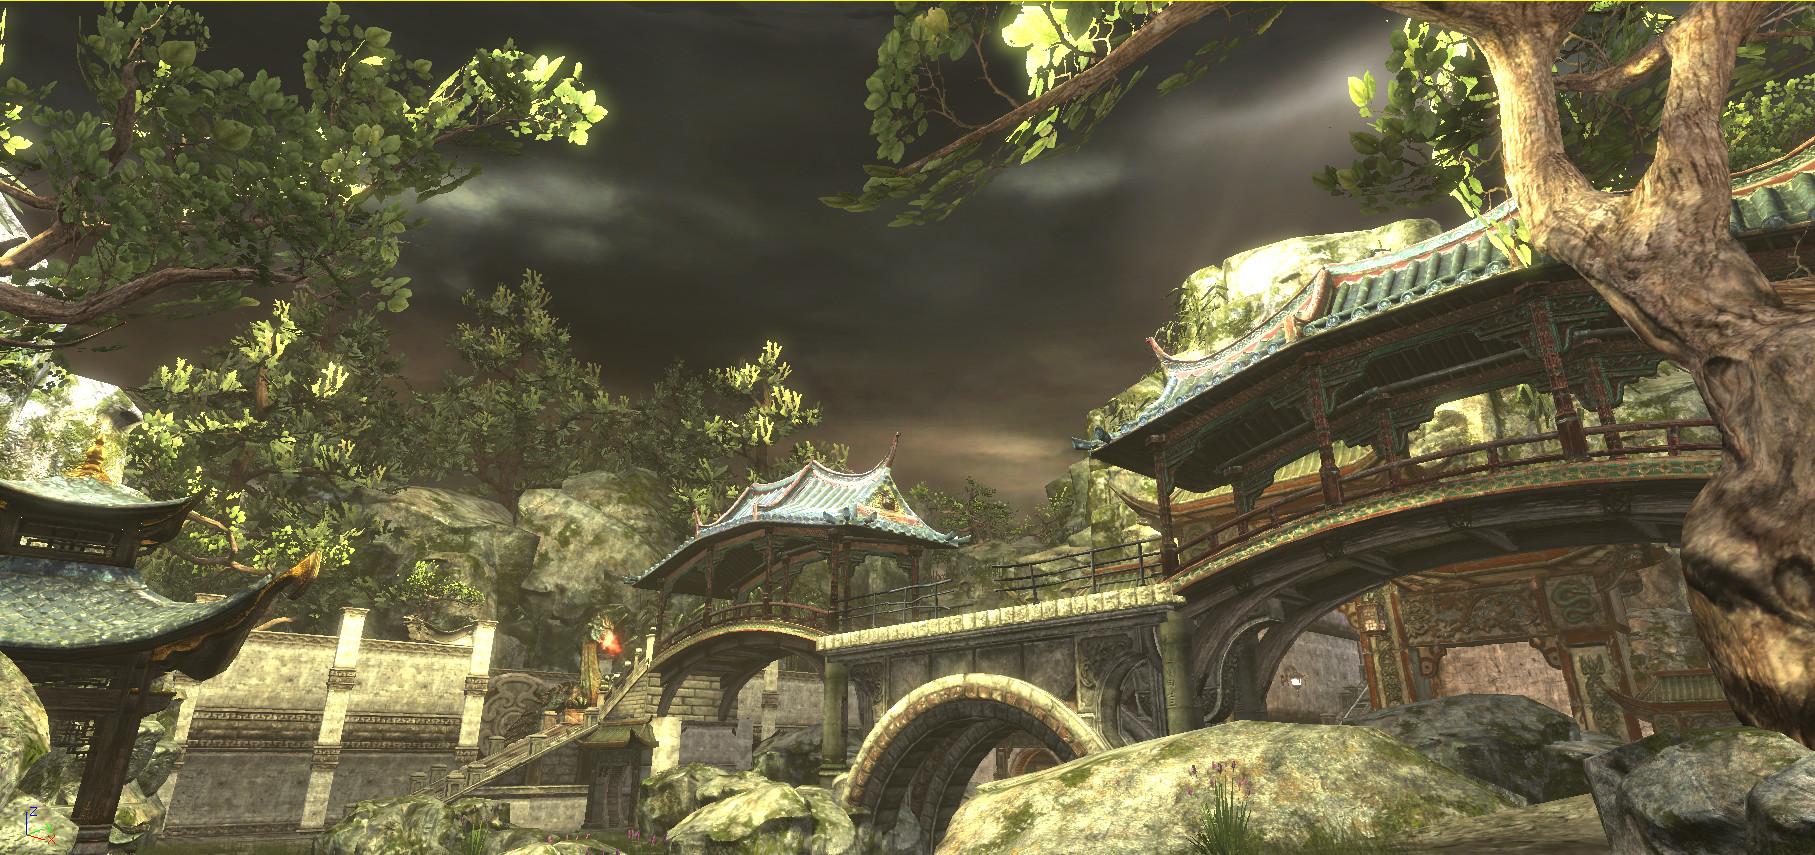 ArtStation - Unreal Engine Level Design / Environment Design